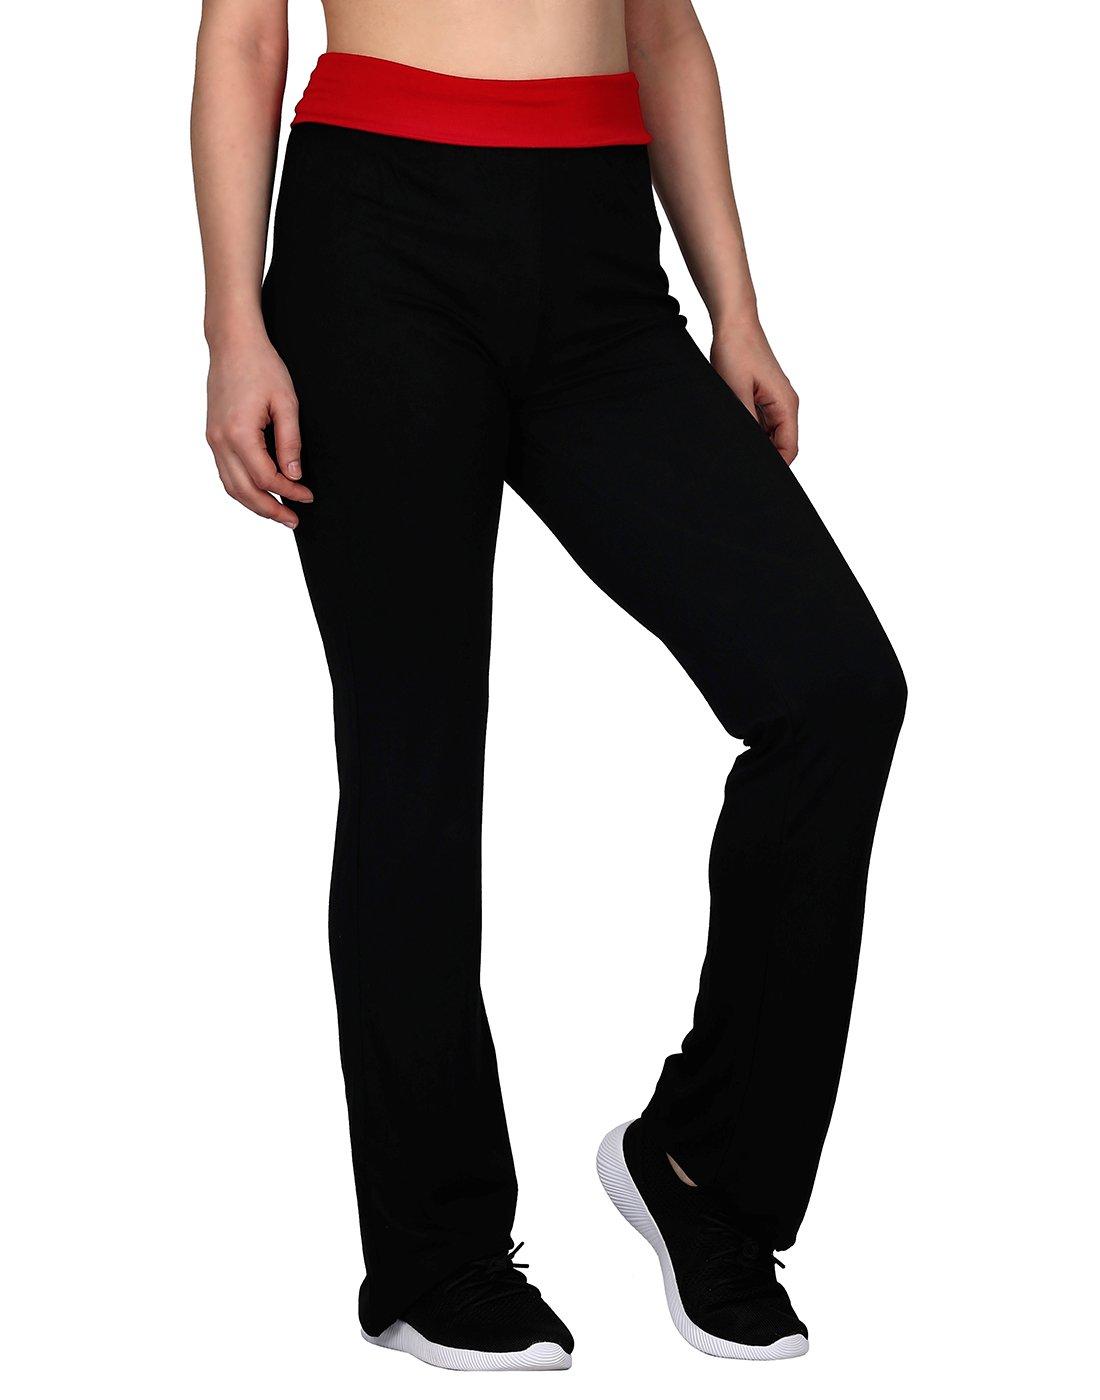 HDE Women's Maternity Yoga Pants Comfortable Lounge Pregnancy Pants Folded Waist (Black & Red, Medium) by HDE